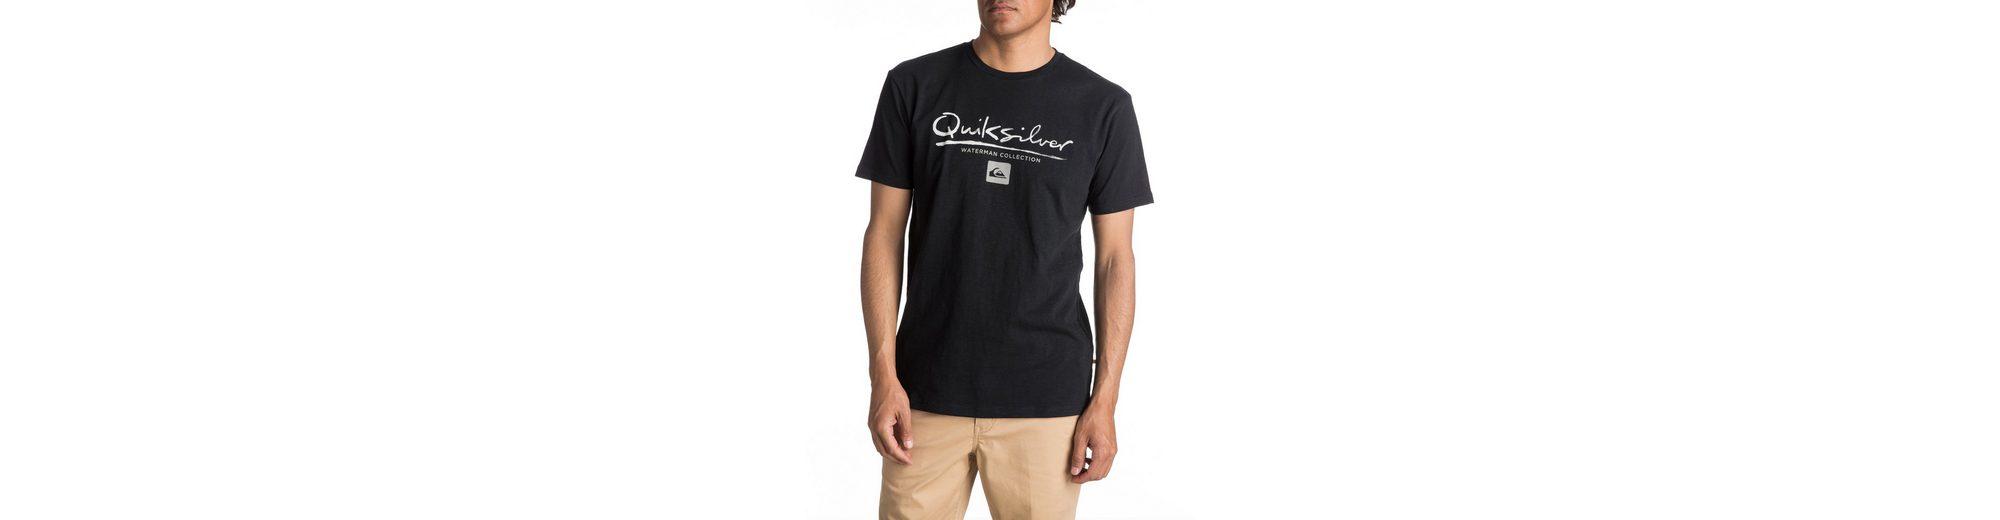 Gut T Waterman Shirt Quiksilver T Shirt Quiksilver Check 5gqqvZxYfw